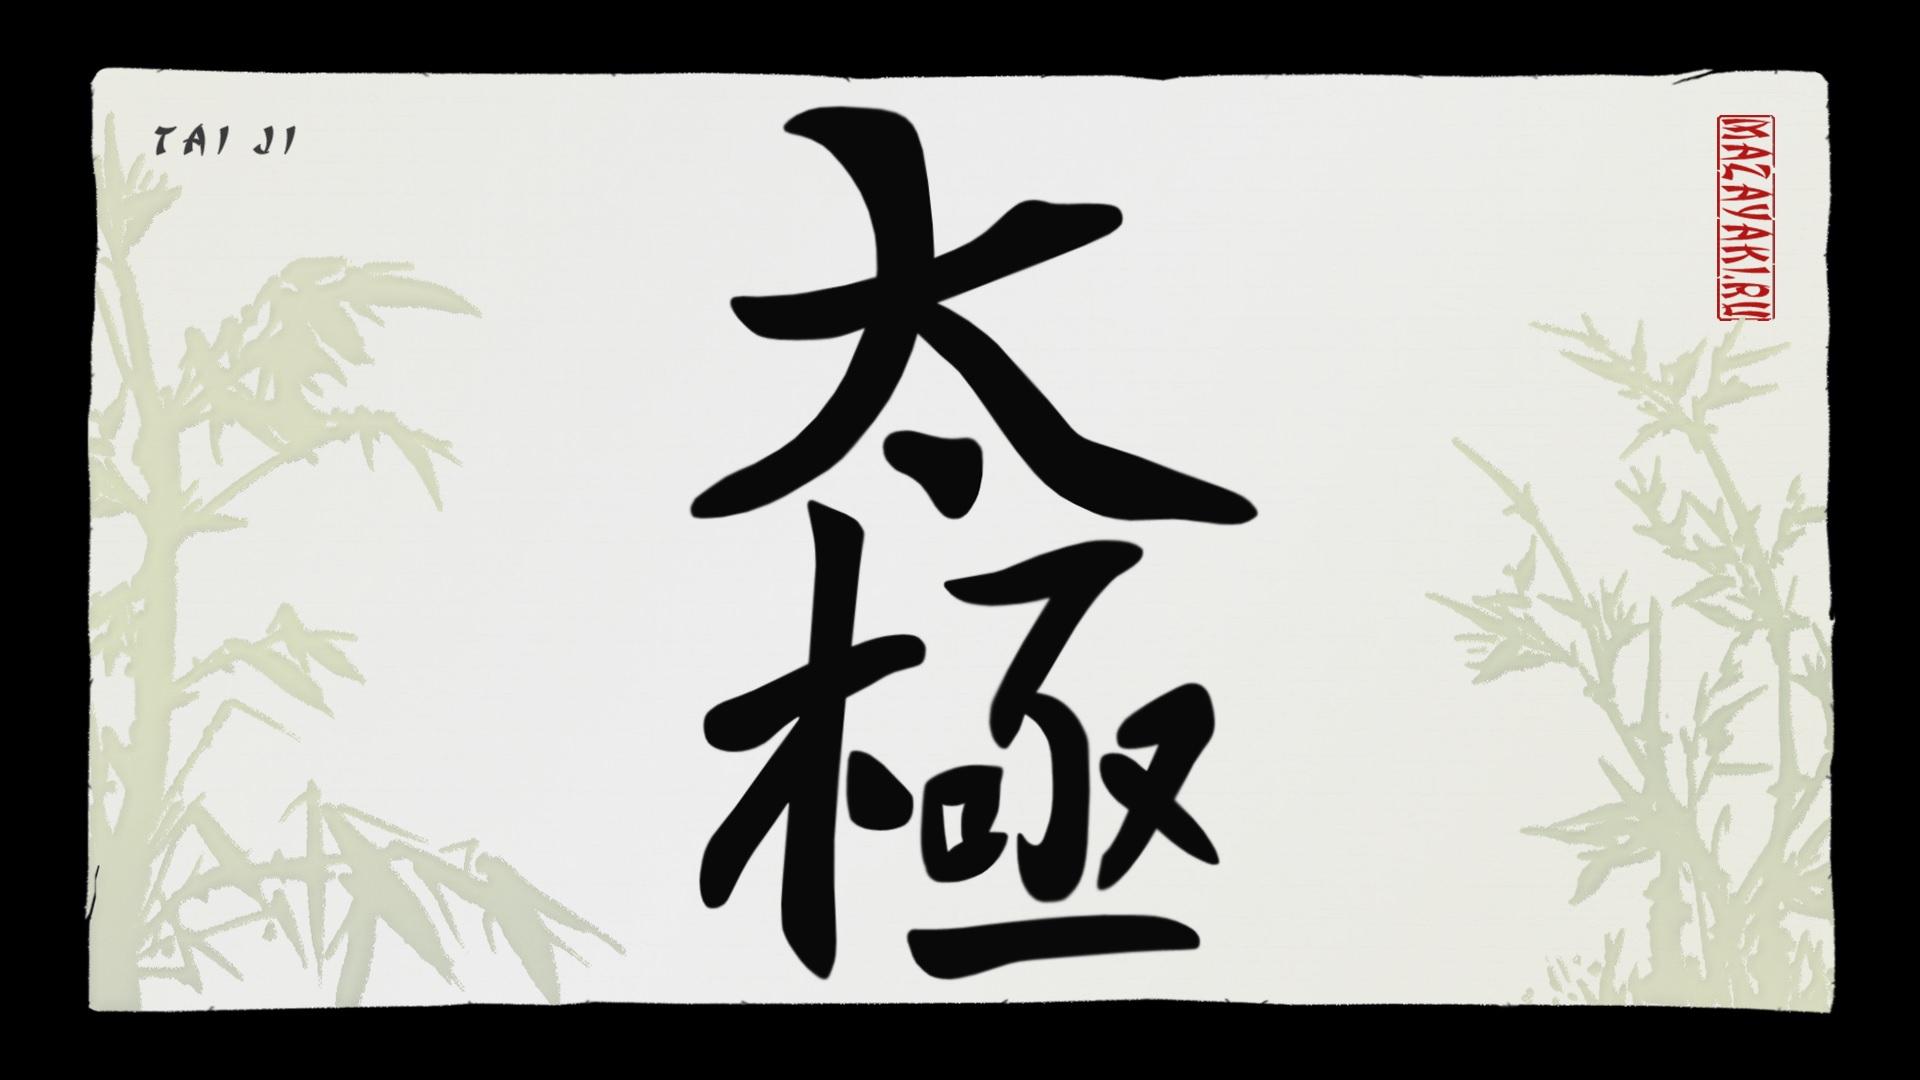 taiji-1920x1080.jpg